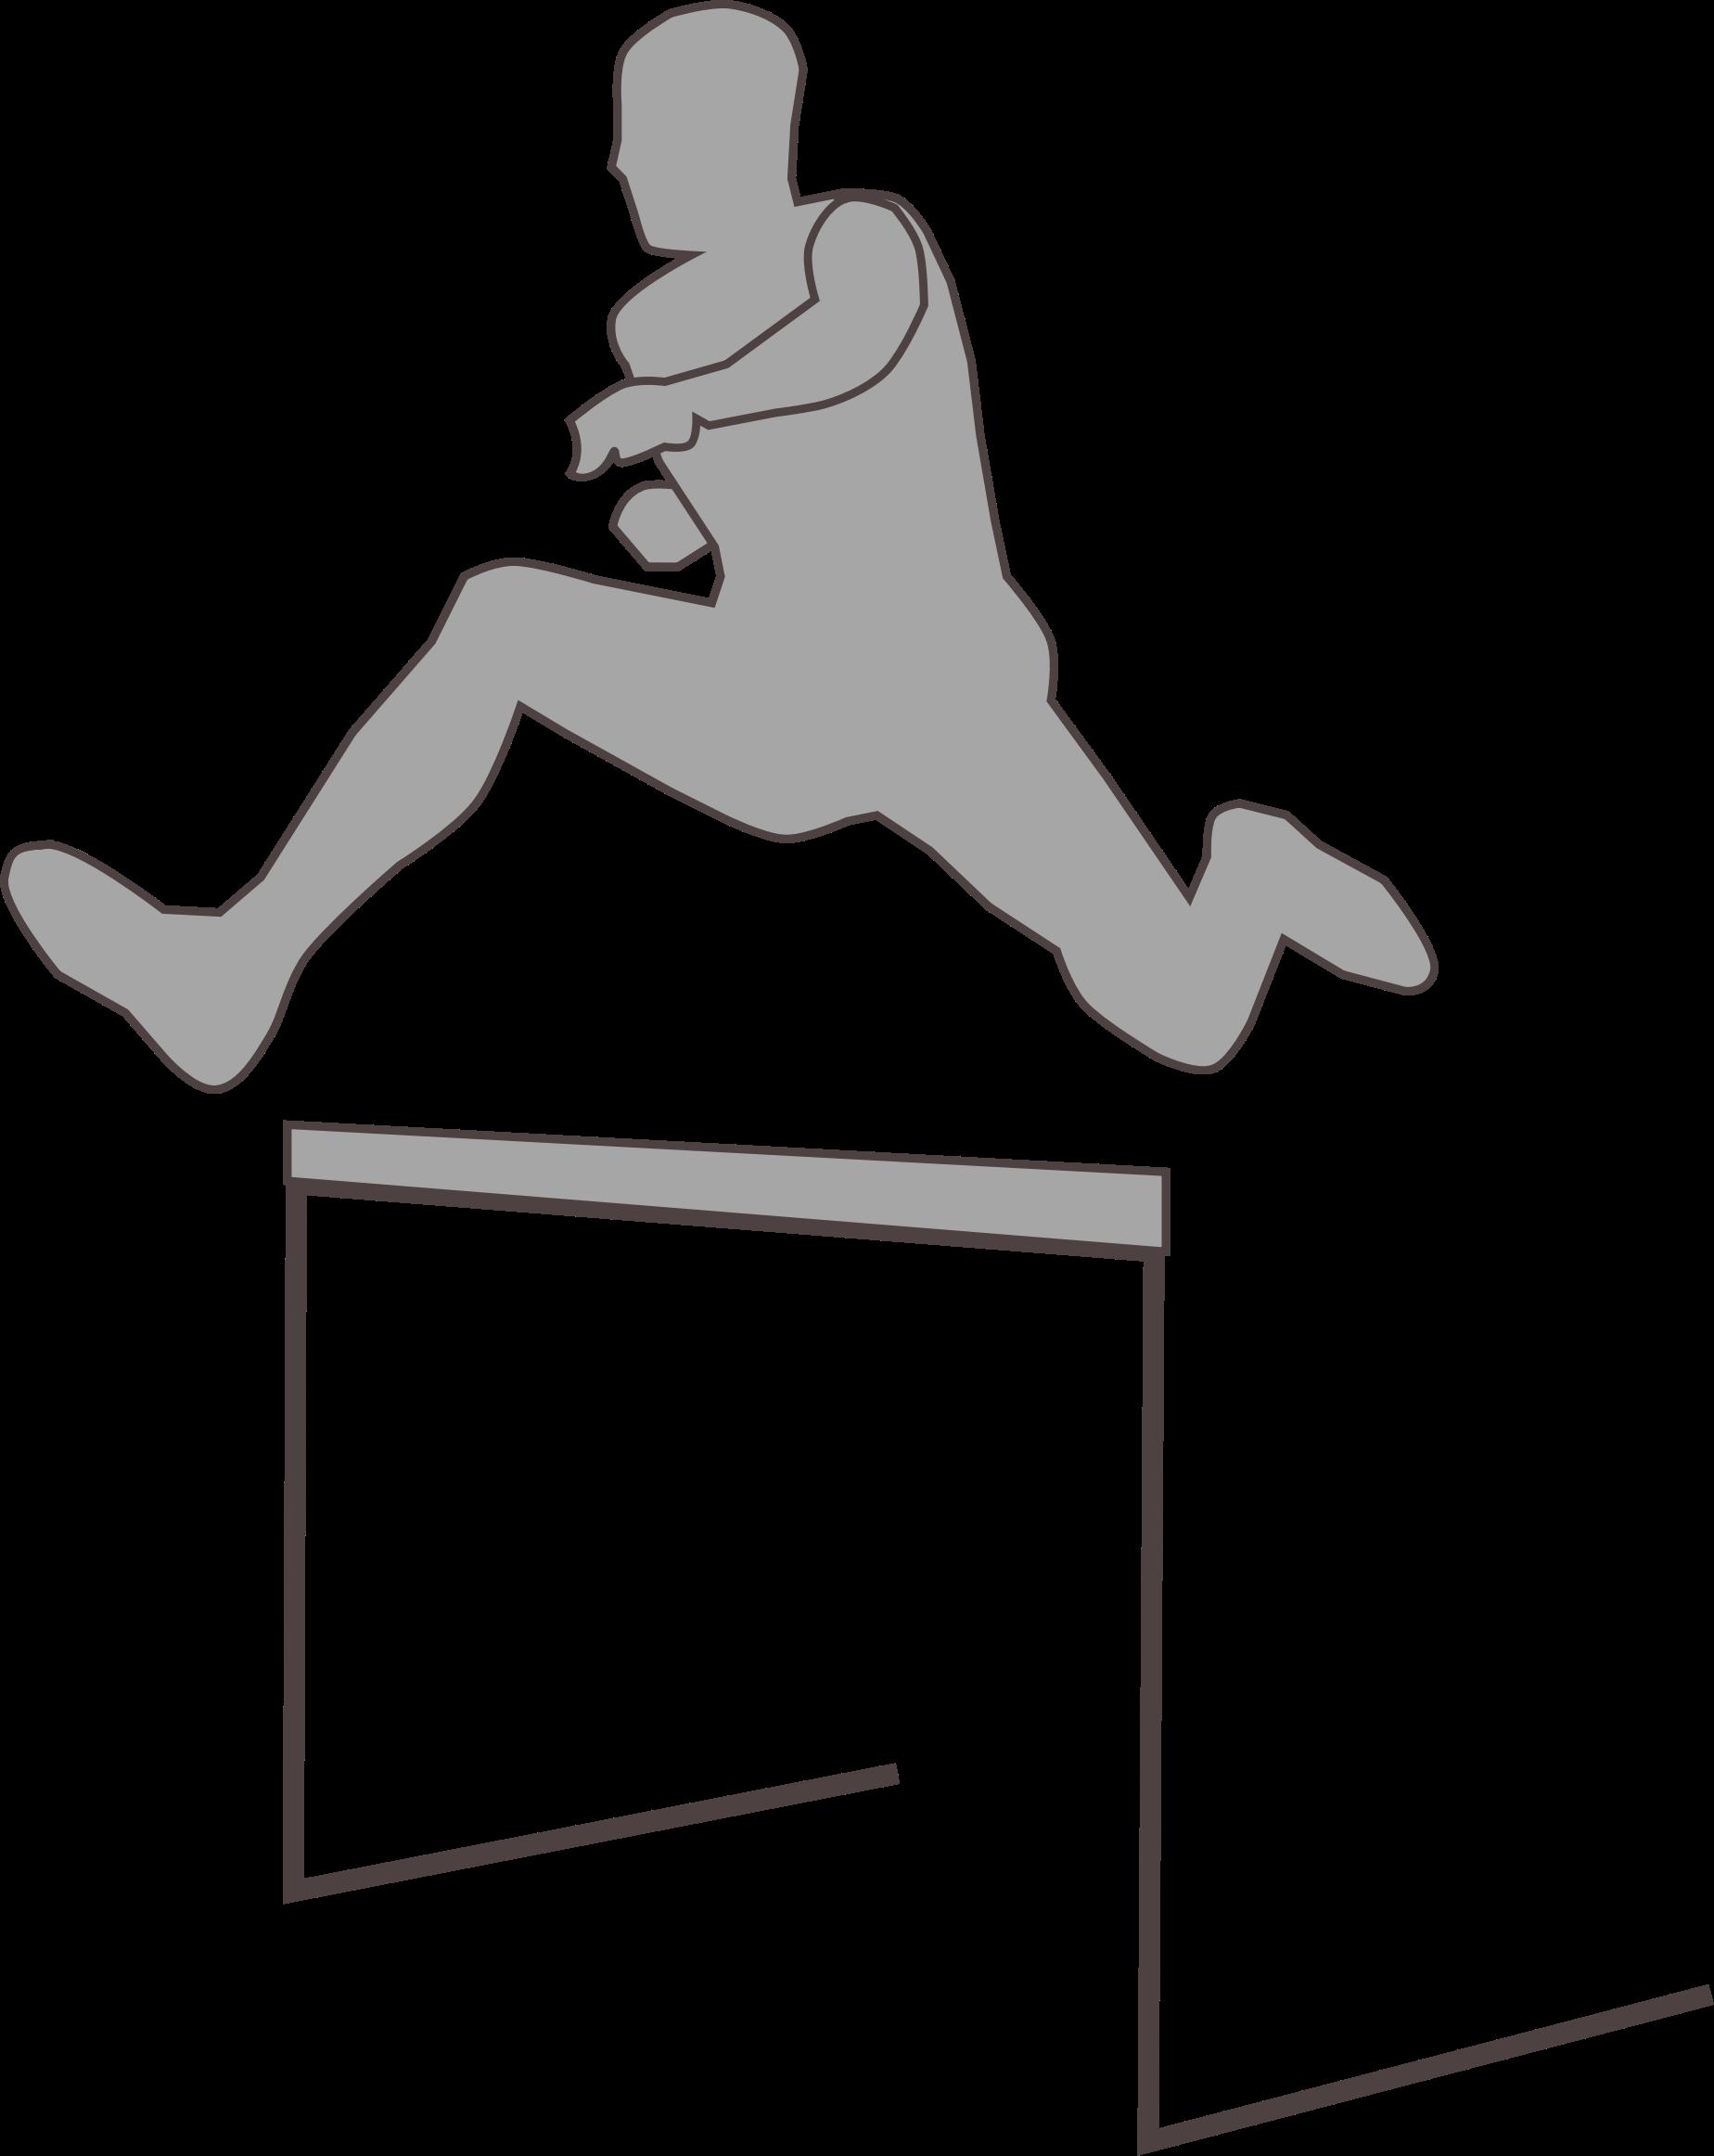 Hurdling silhouette big image. Hop clipart jumping